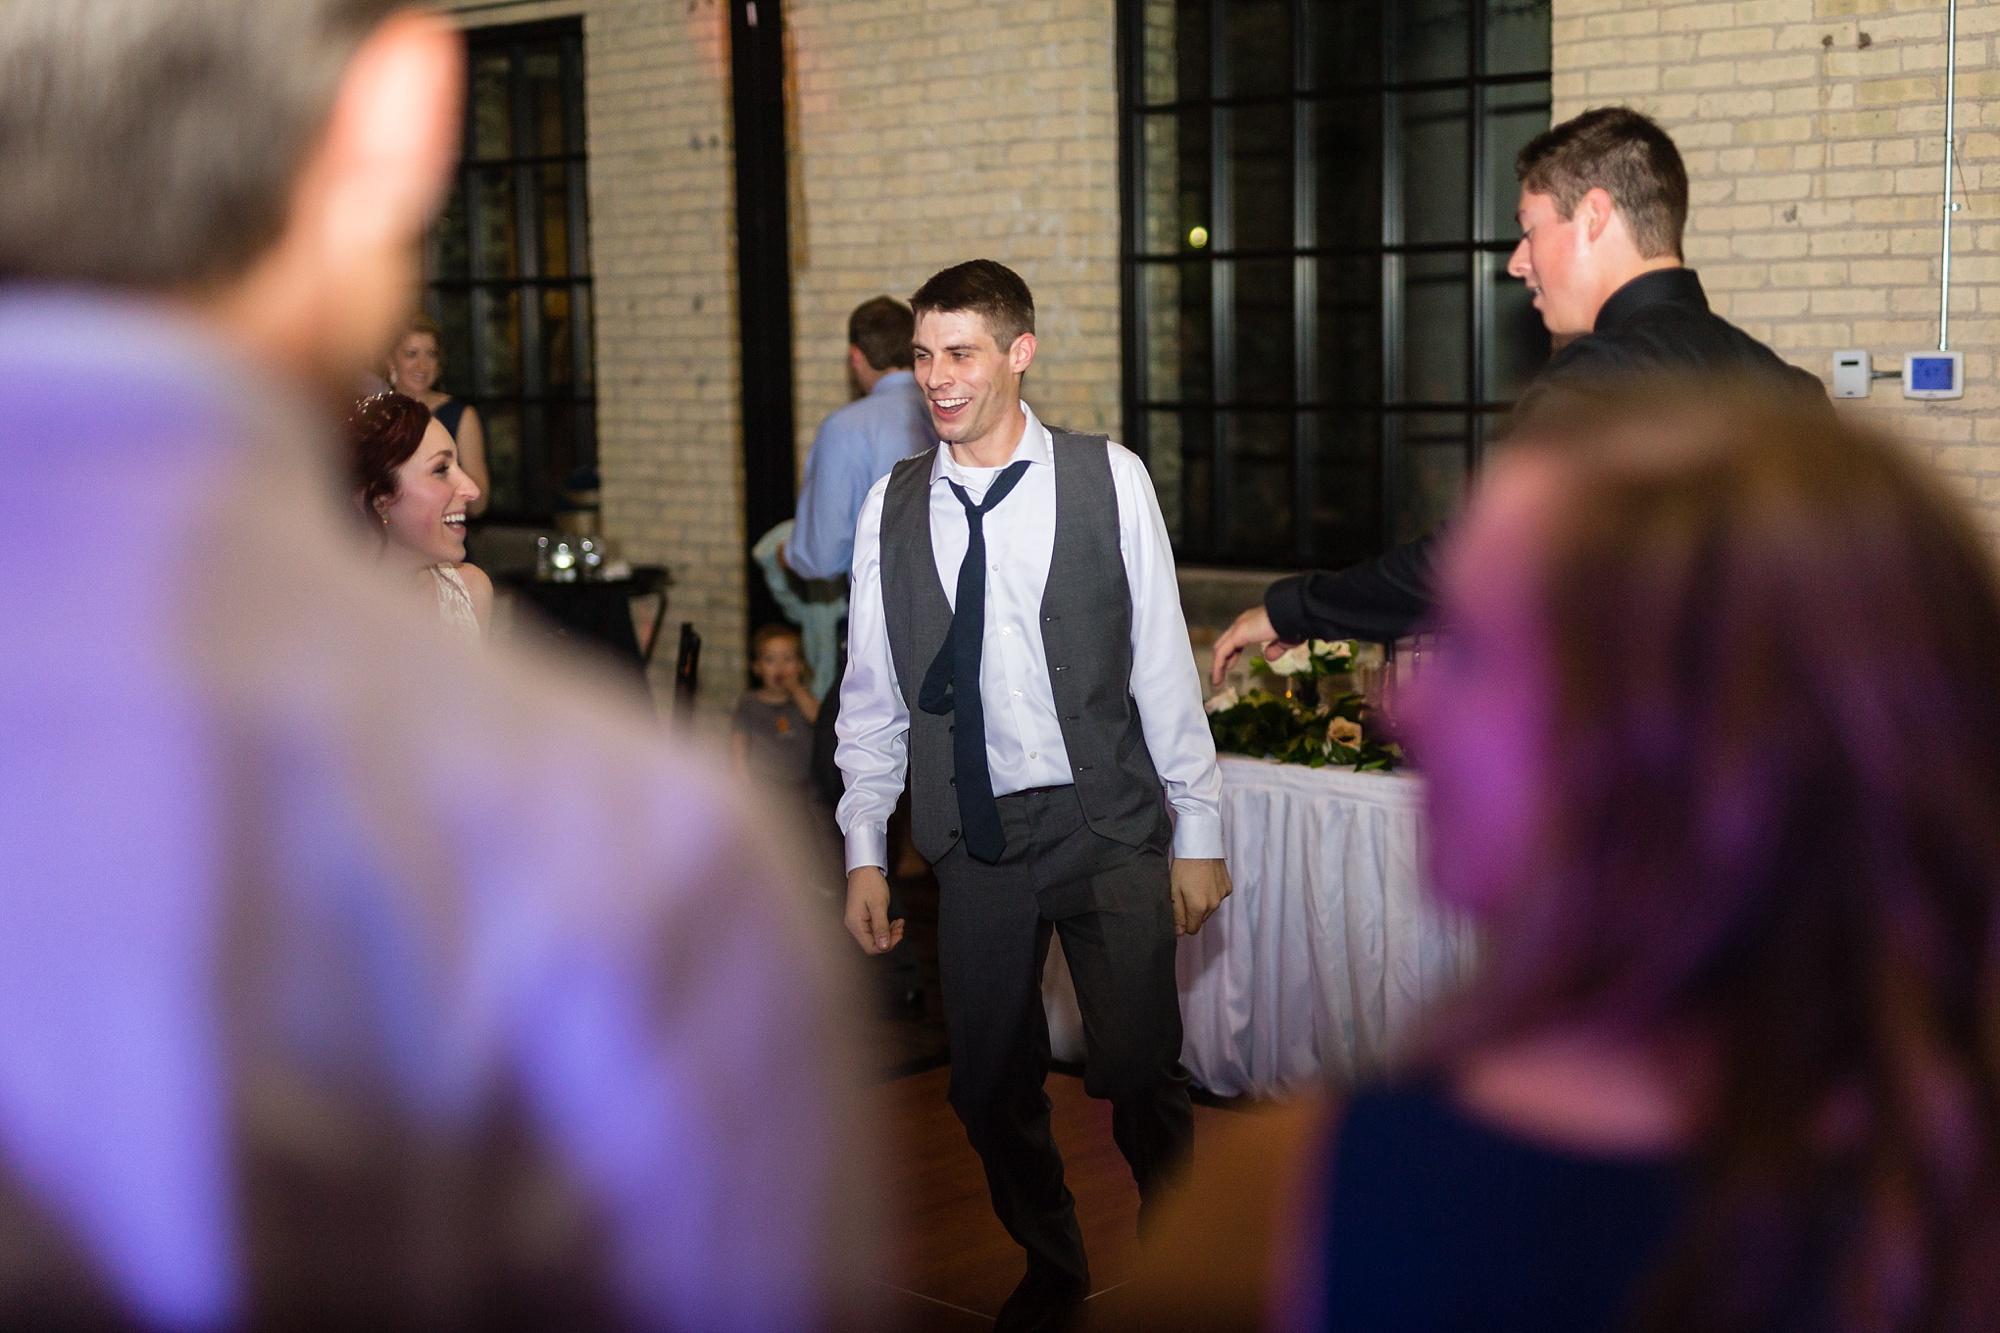 Brandon_Shafer_Photography_Lauren_Ethan_New_Vintage_Place_Grand_Rapids_Wedding_0053.jpg